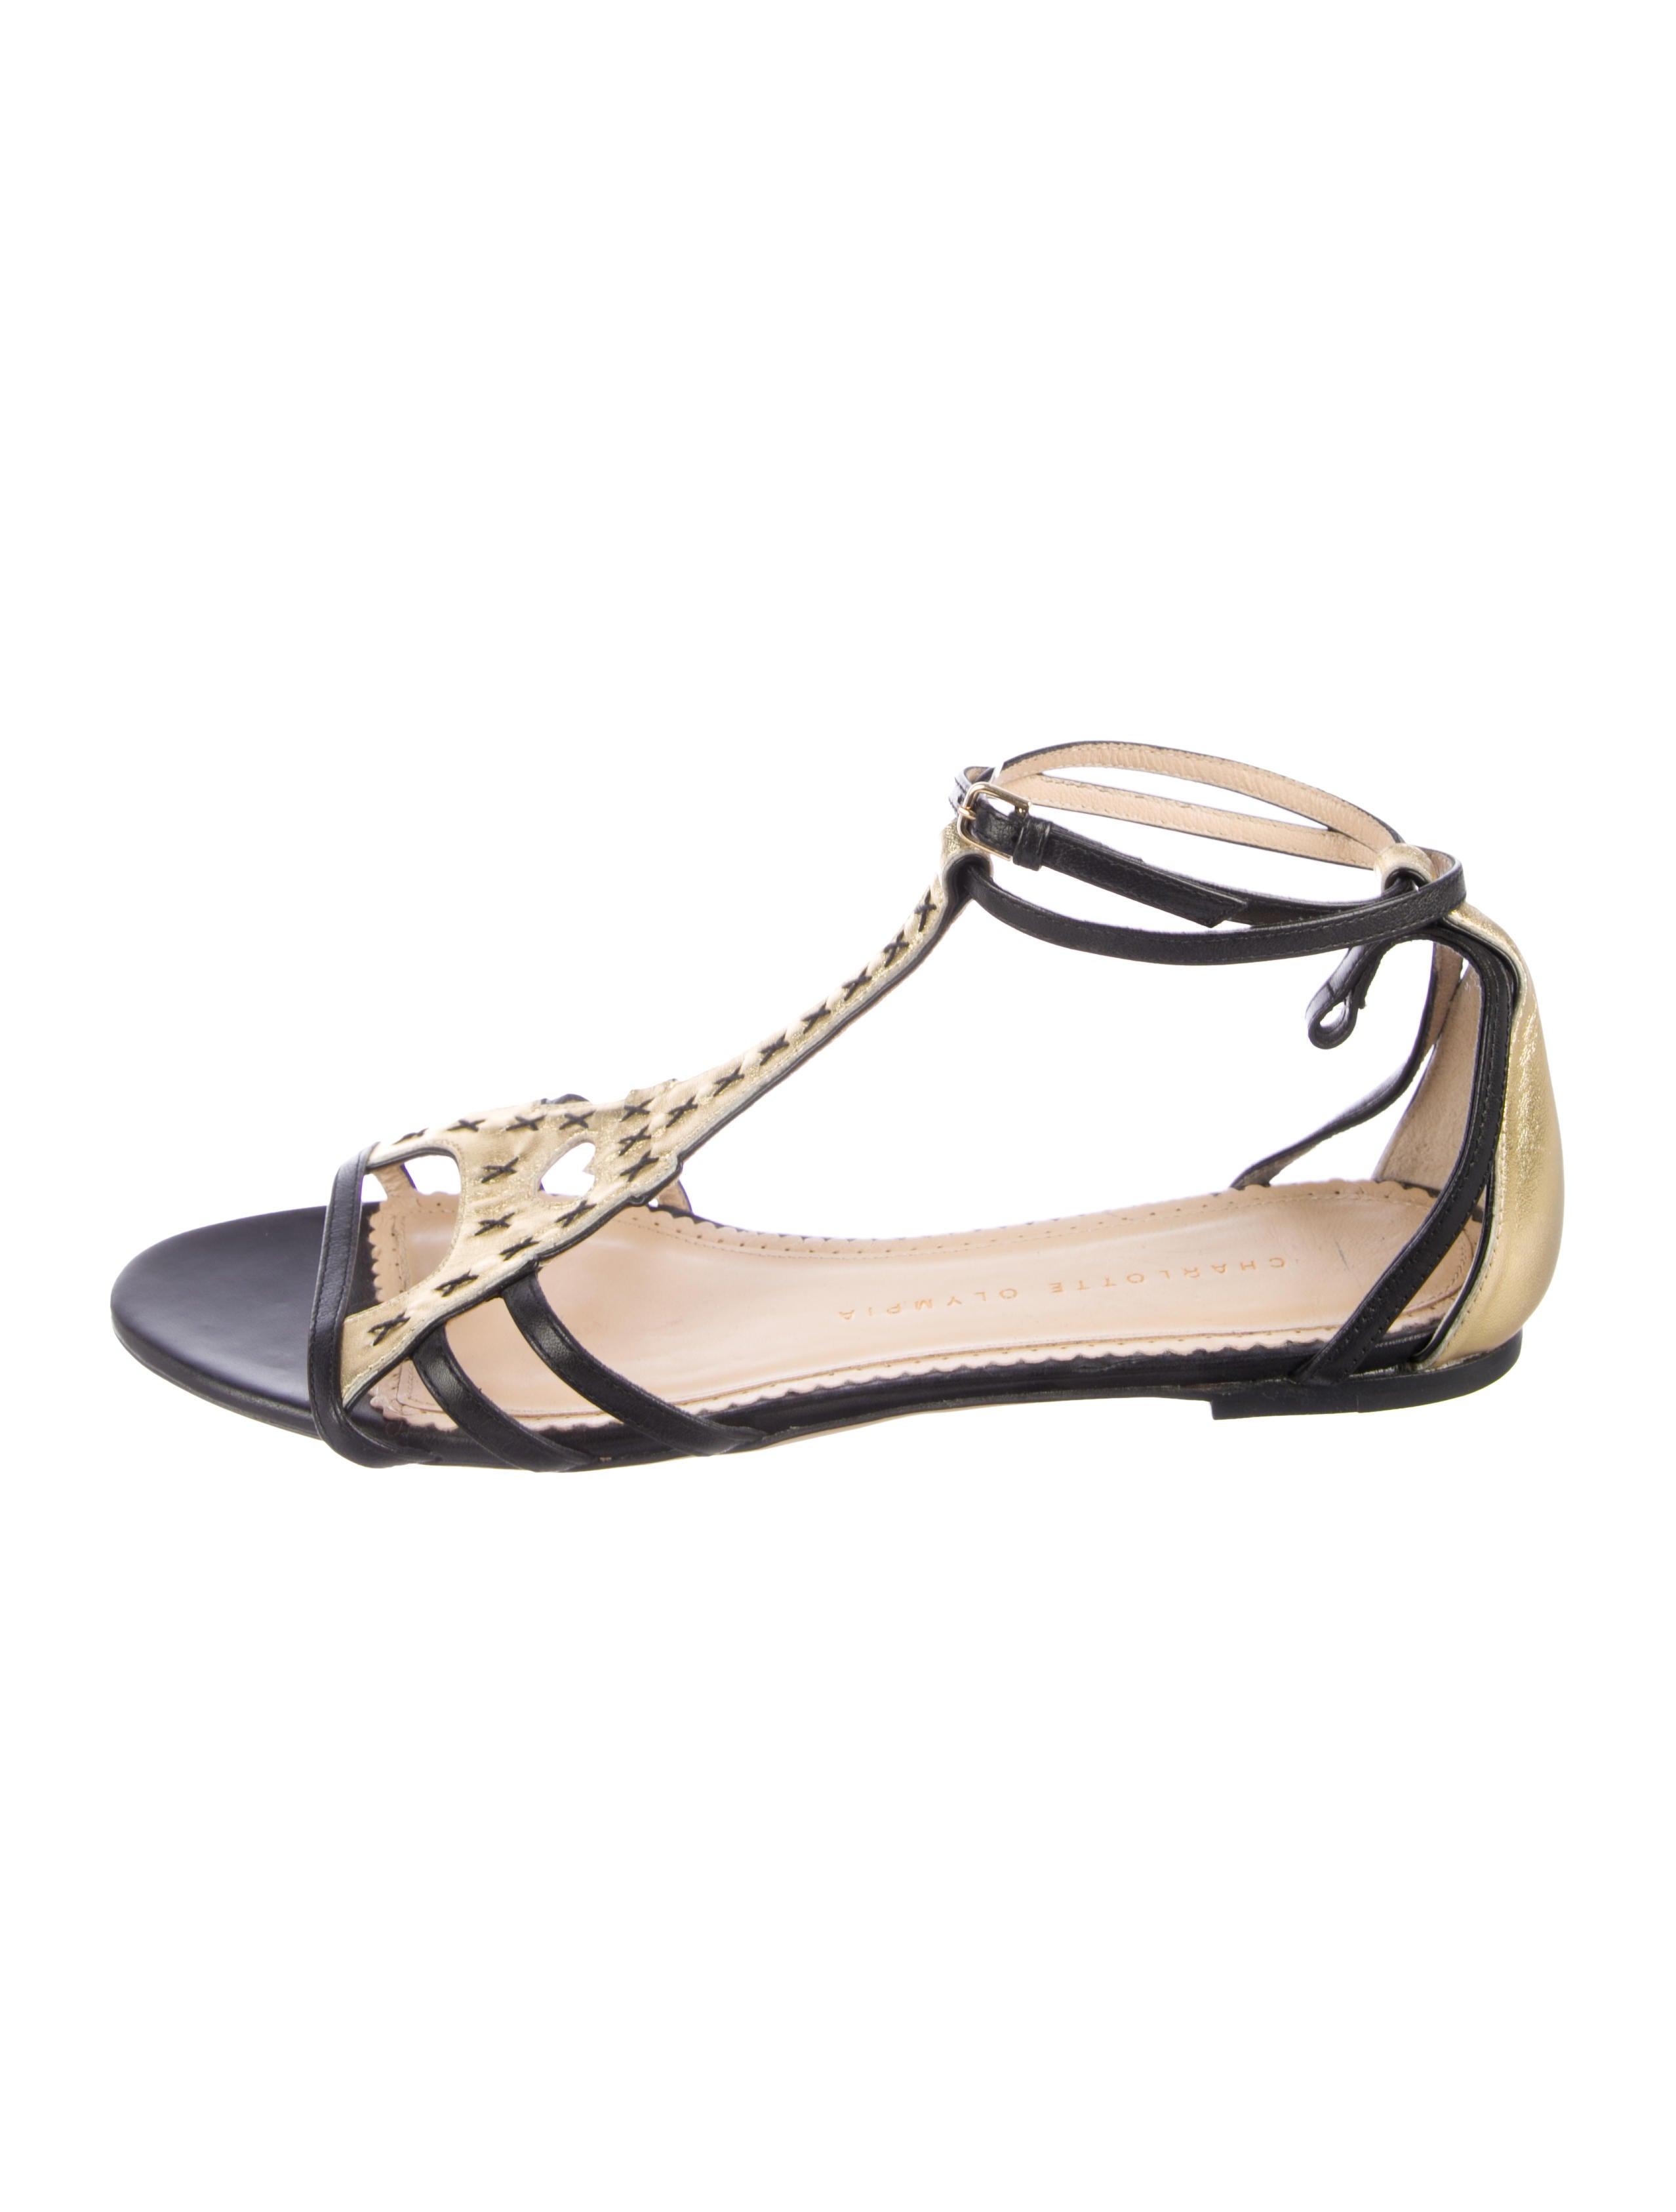 3b37befeda1 Eiffel Tower Leather Sandals